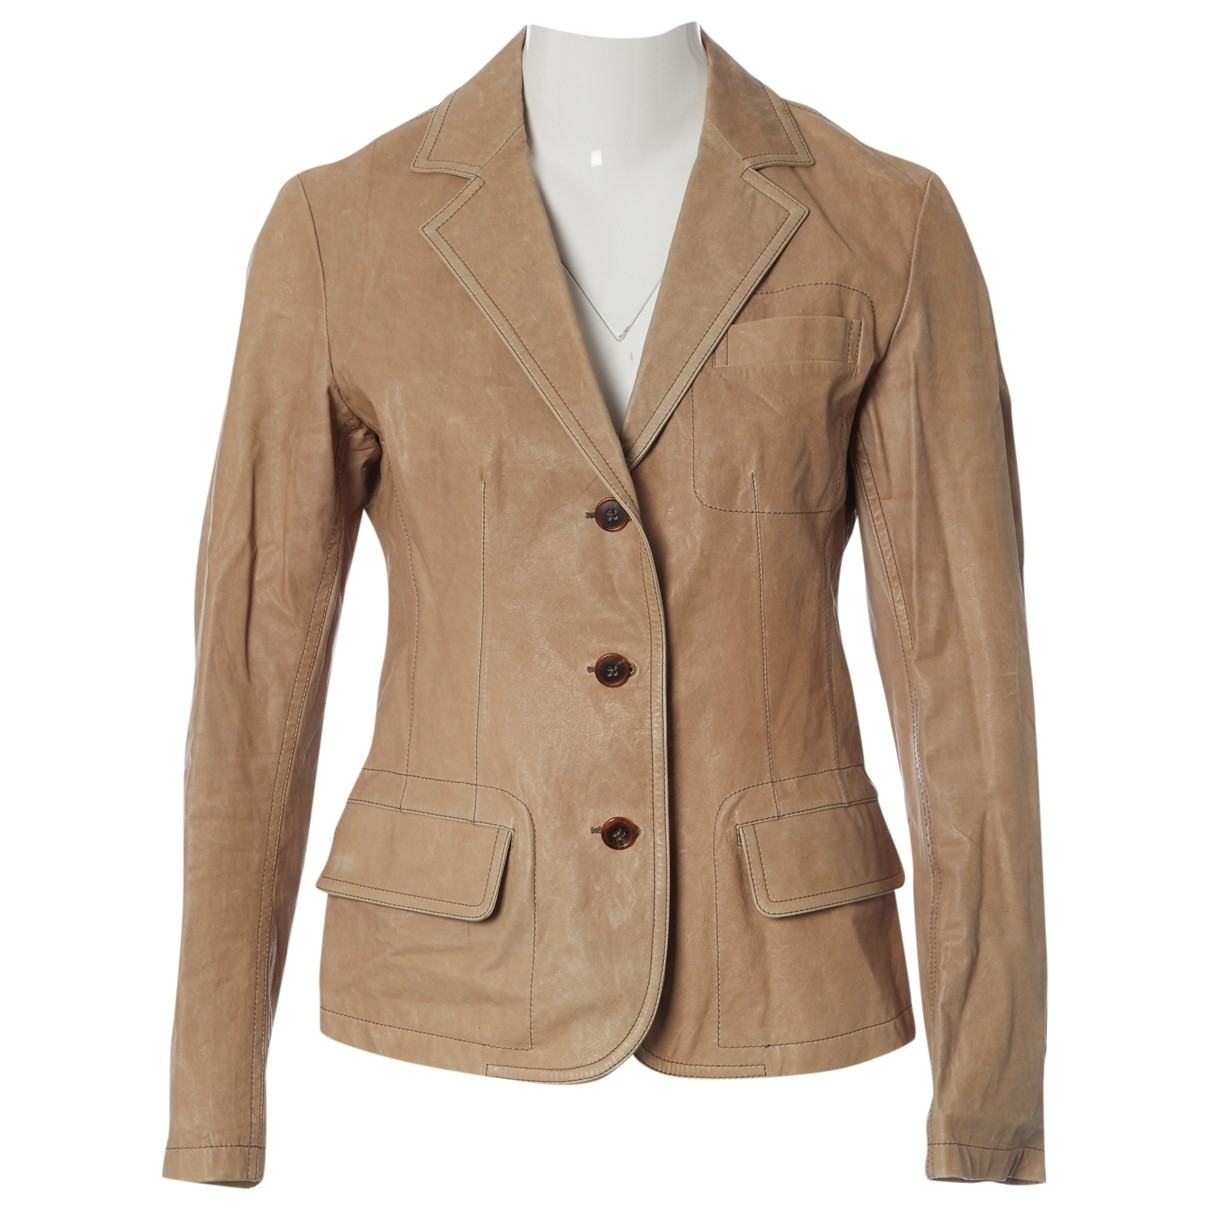 Jil Sander \N Beige Leather jacket for Women 40 FR